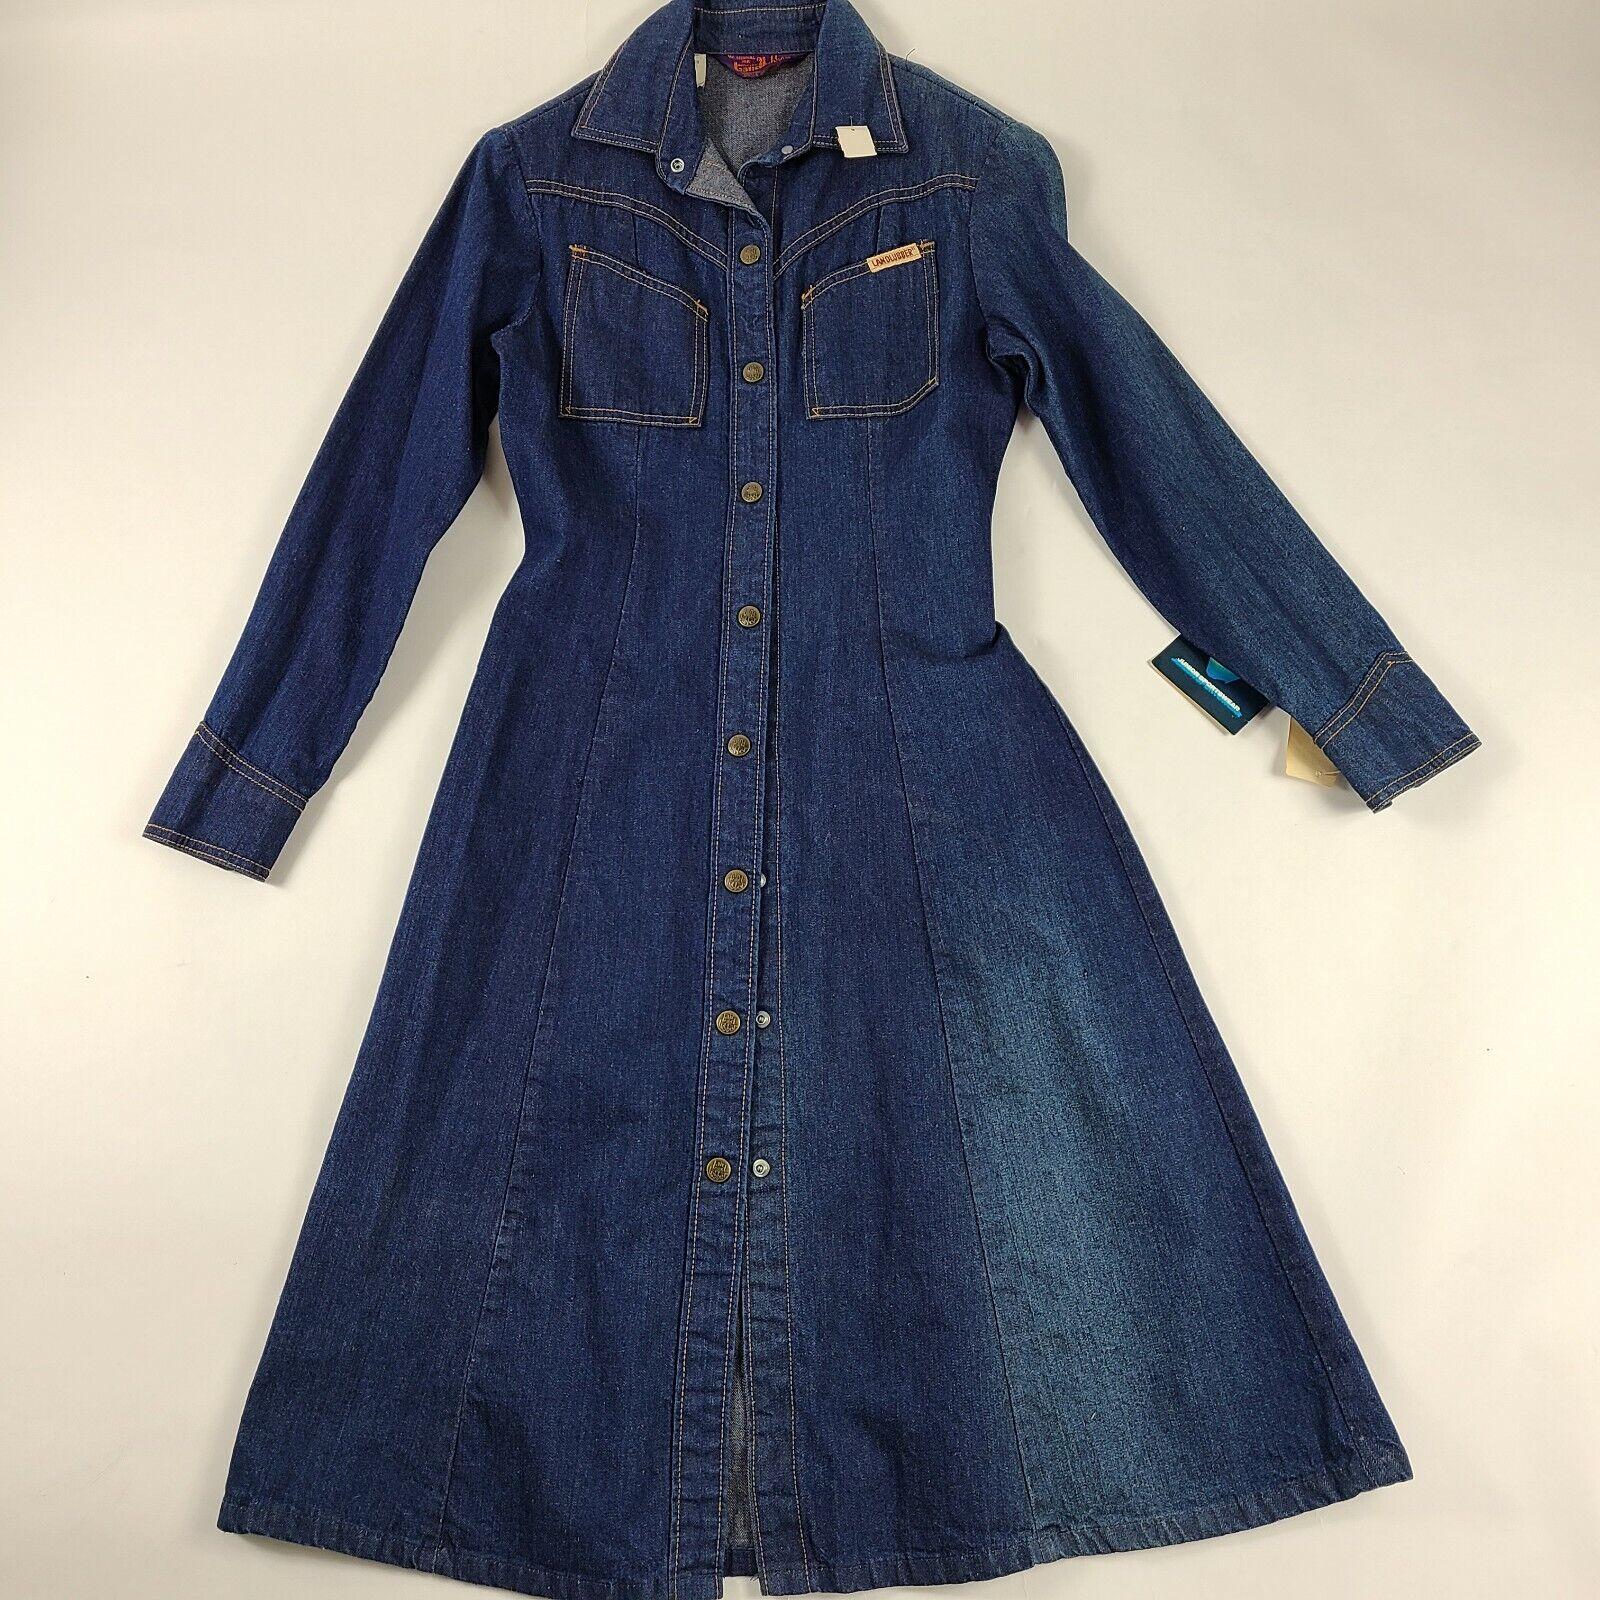 VINTAGE Landlubber Denim Midi Shirt Dress DEADSTO… - image 1